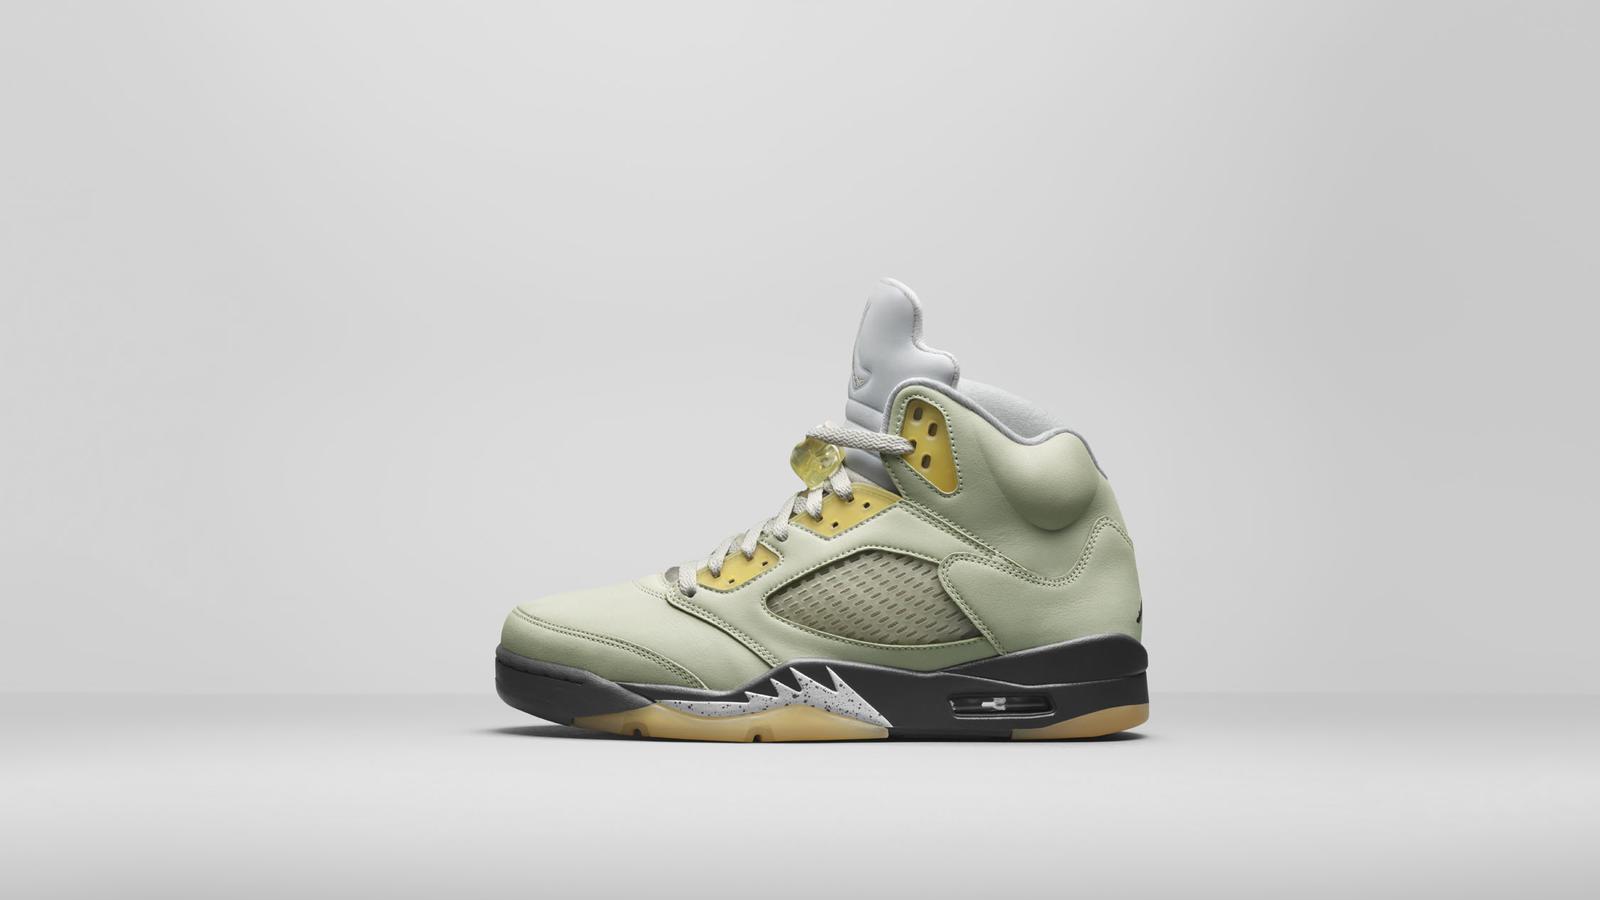 Nike News Jordan Brand Ho21 Retro Preview Aj V Retro Dc7501 300 A1 Lateral V02 Lr